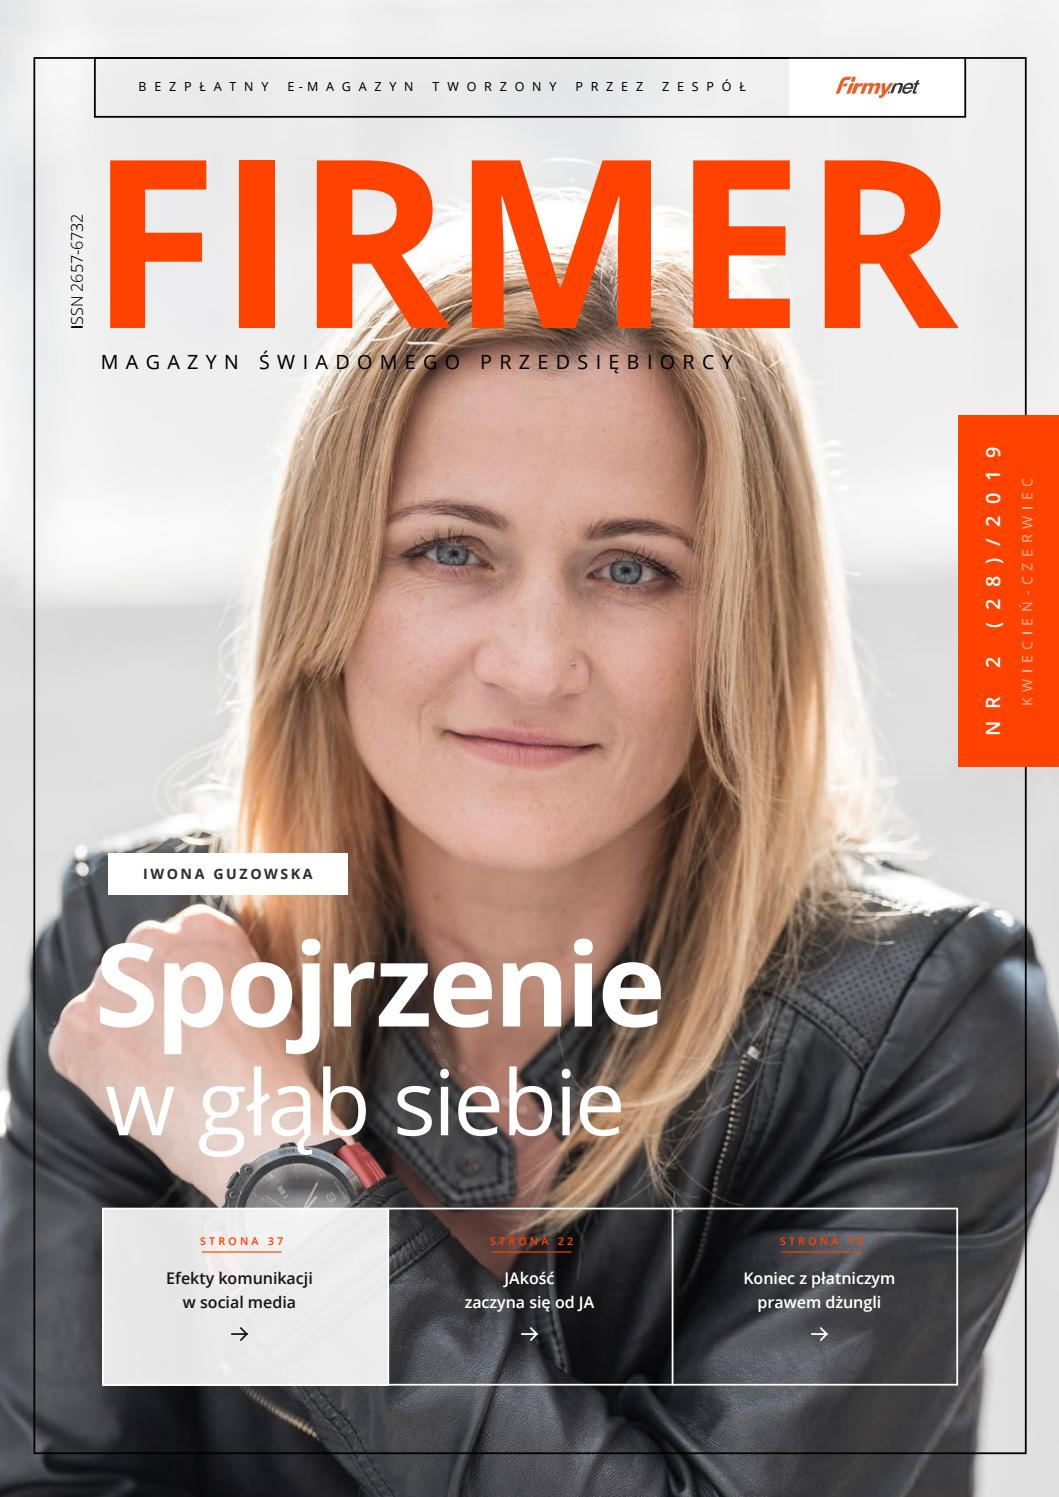 95fdac3c3e3f7 Firmer 02 2019 by FIRMER - issuu